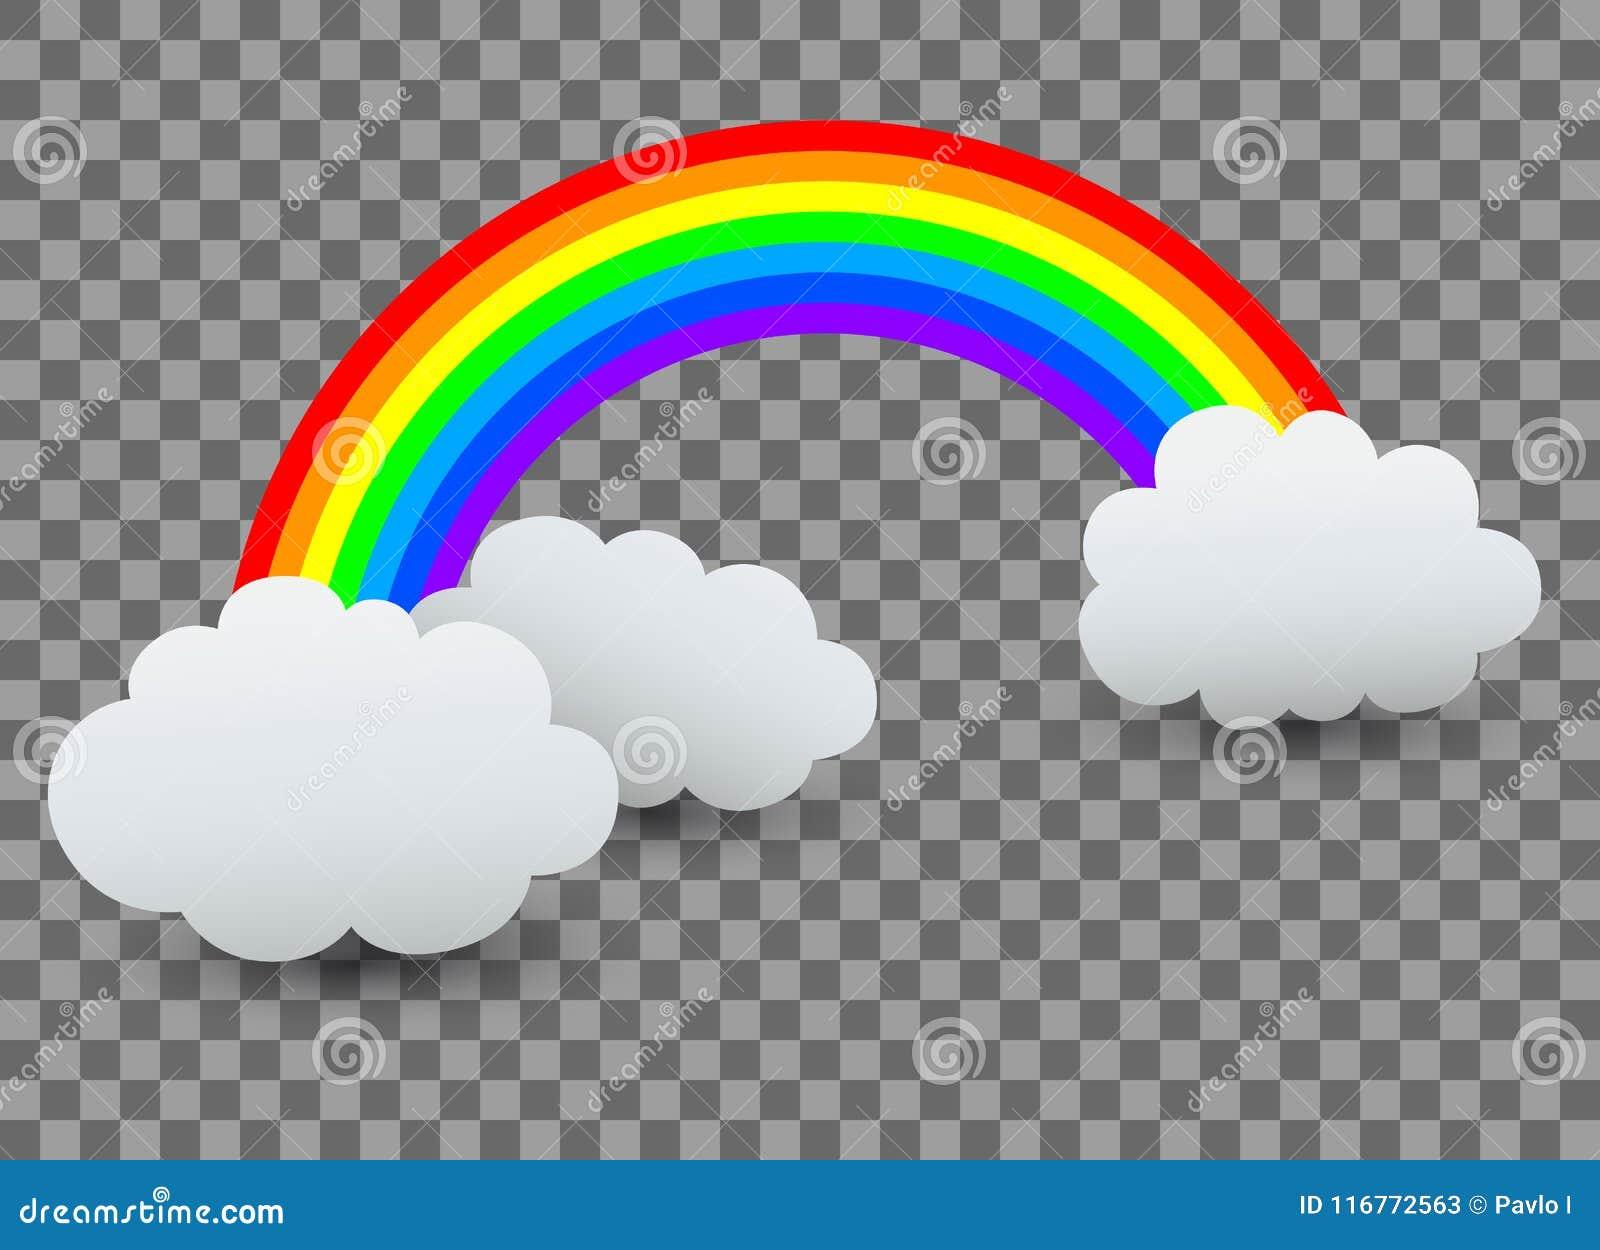 Arco iris con la nube -